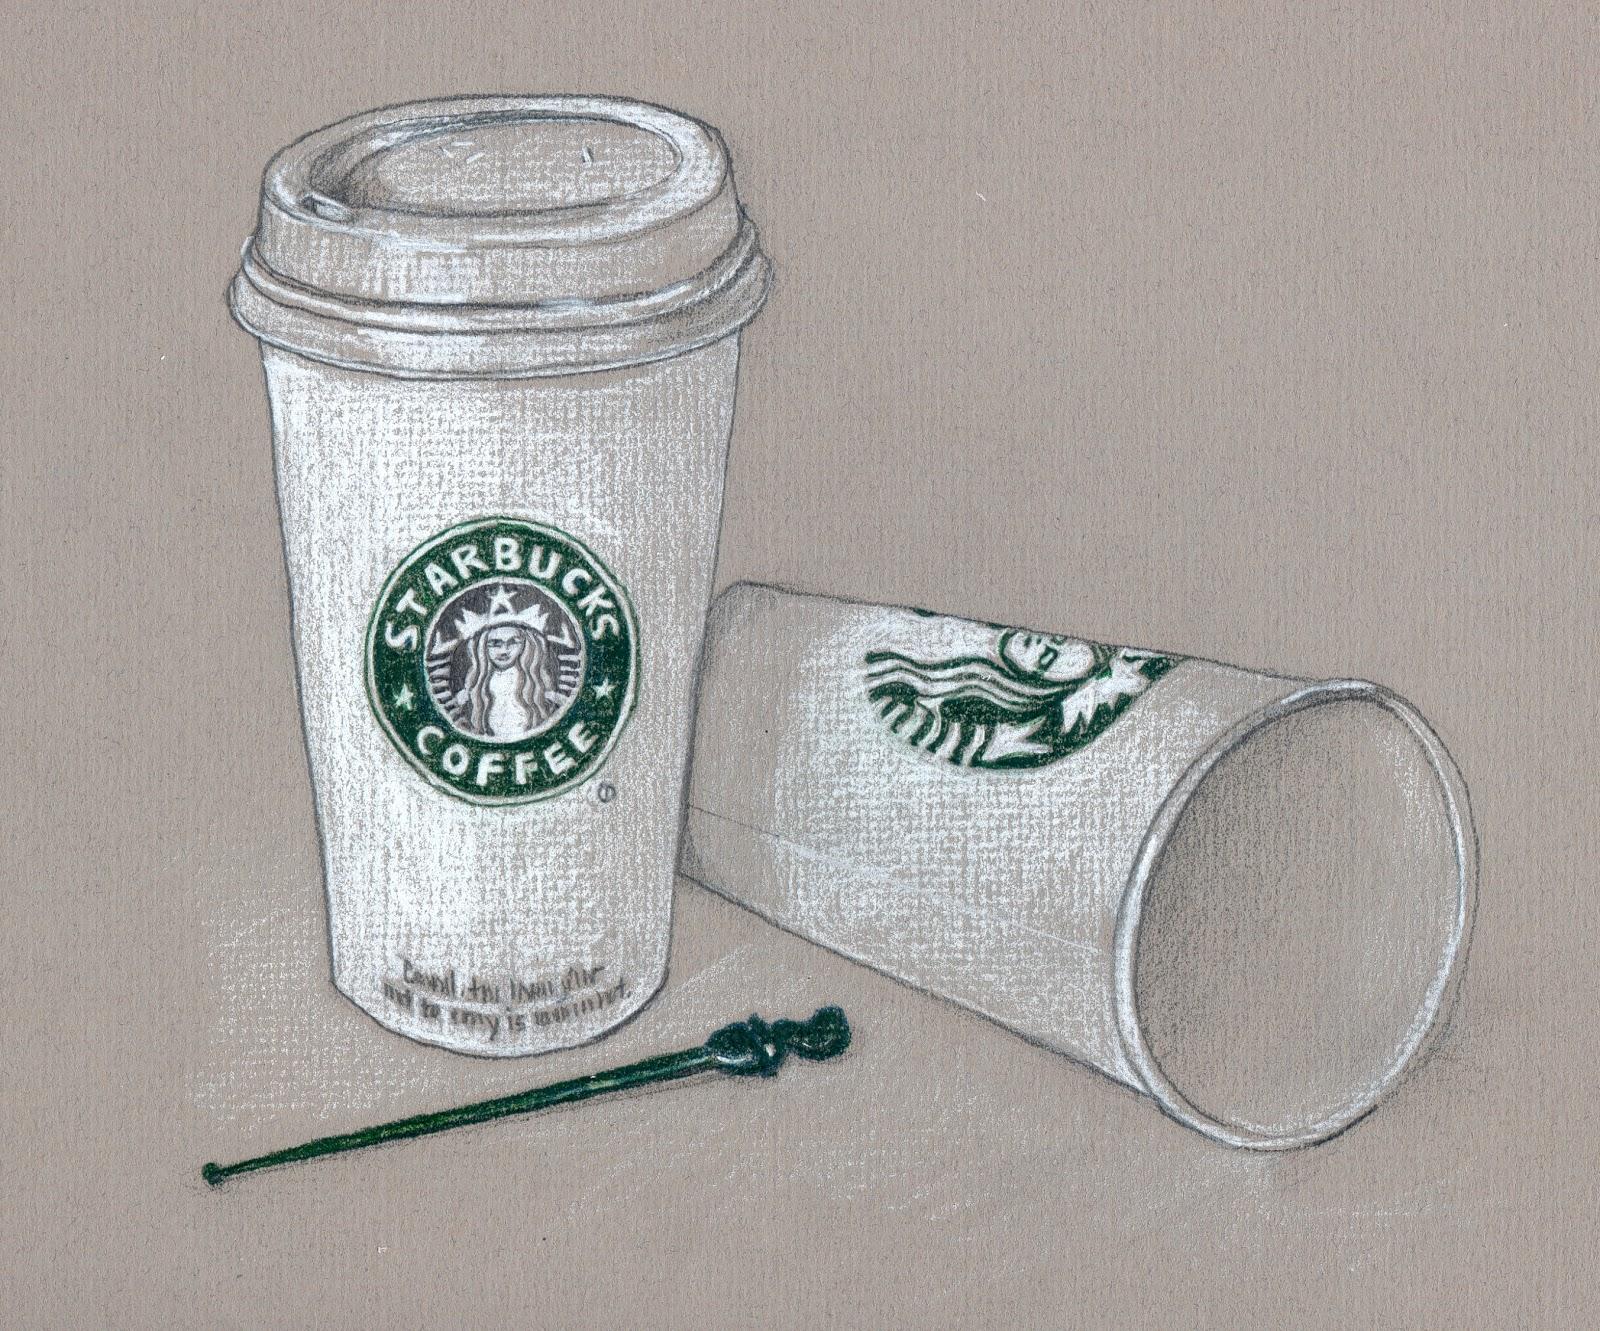 Sarah Melling: Pencils and Paper: Illustration Friday: Stir